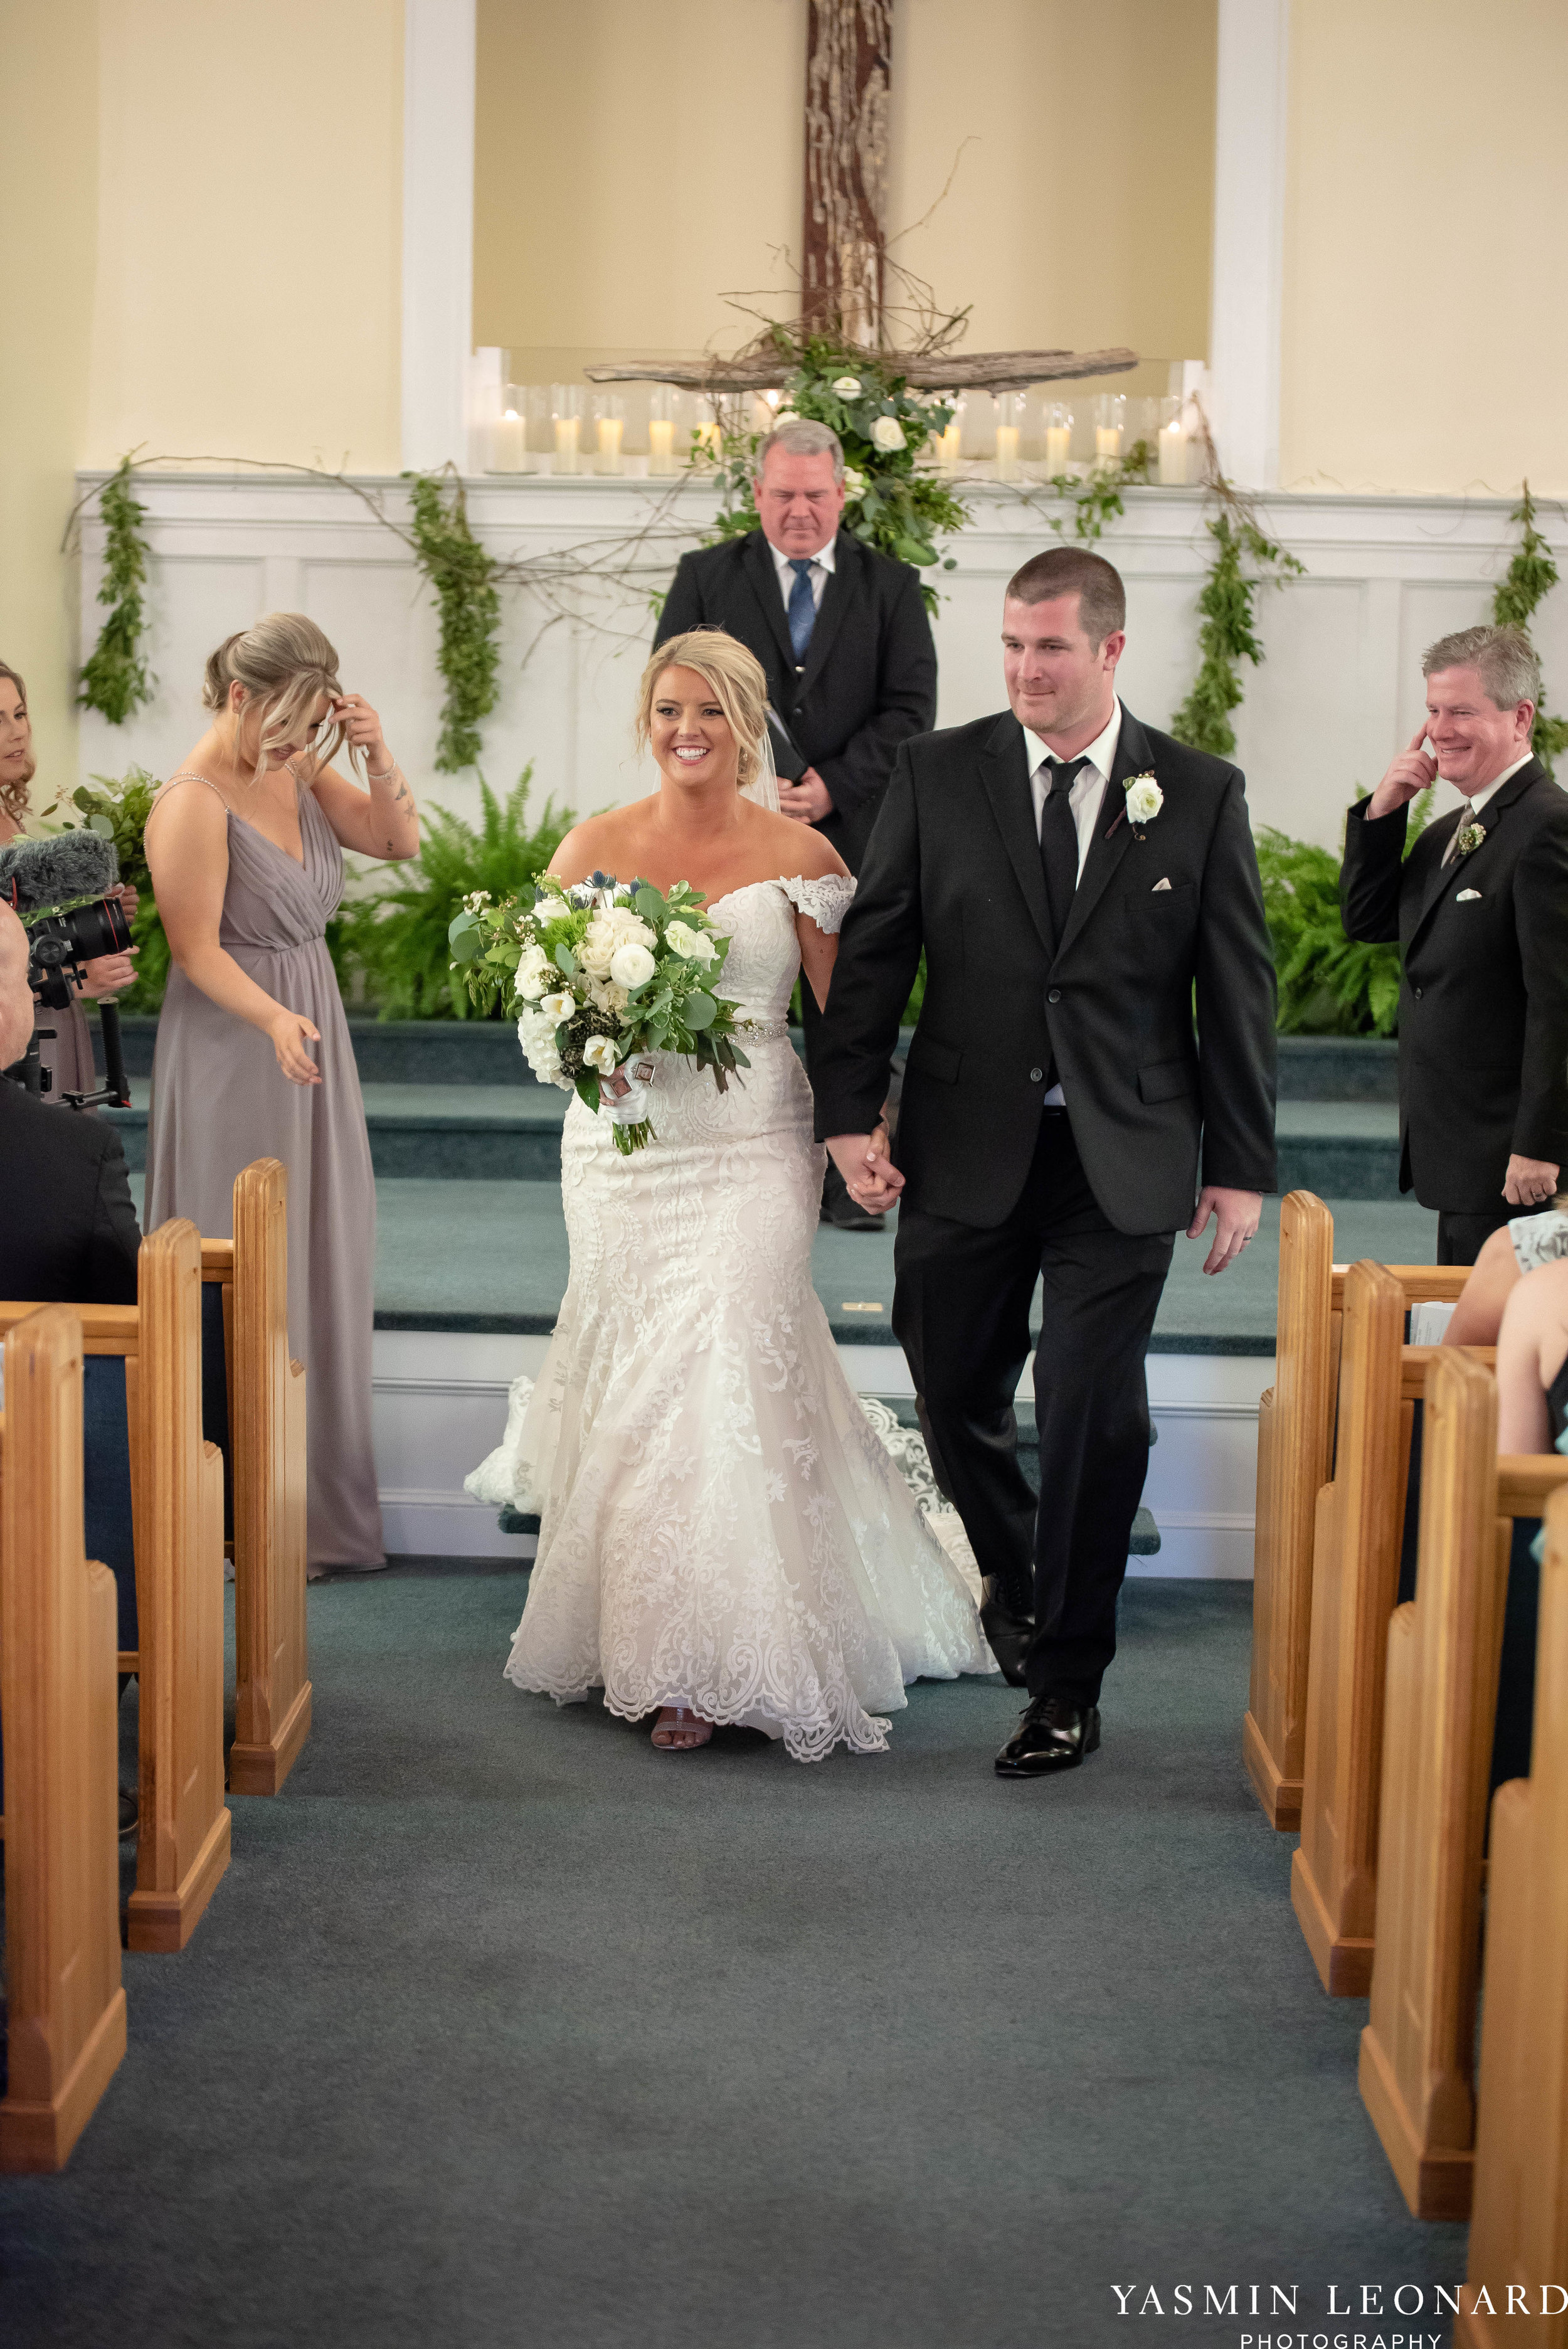 Carolina Beach Wedding - Fort Fisher Wedding - NC Acquarium - Beach Wedding - NC Wedding - Beach Wedding Inspiration - Beach Bride-21.jpg